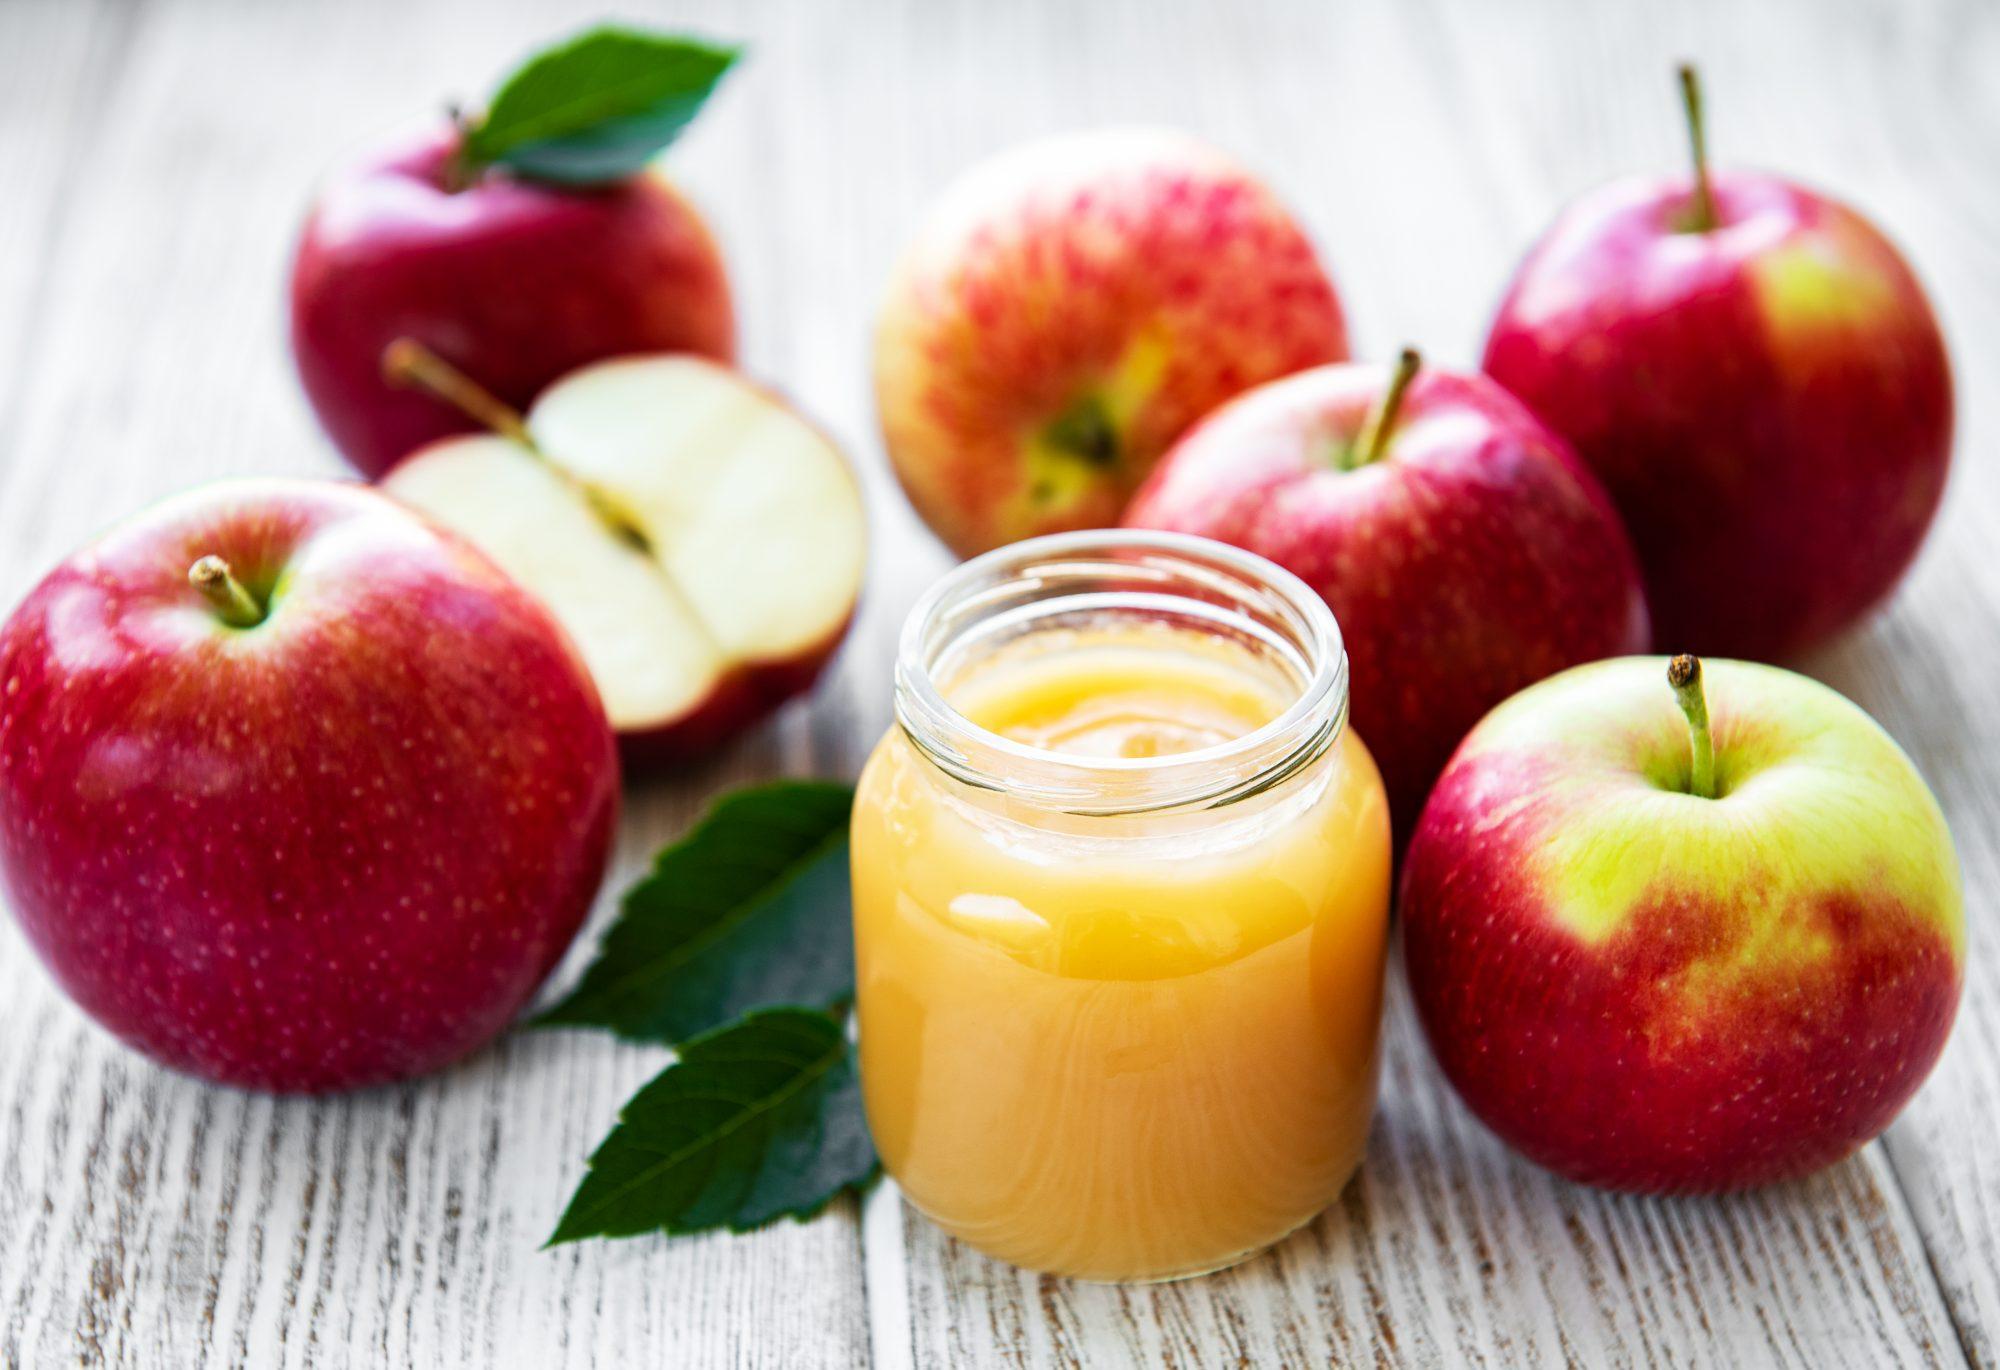 Applesauce Getty 3/23/20